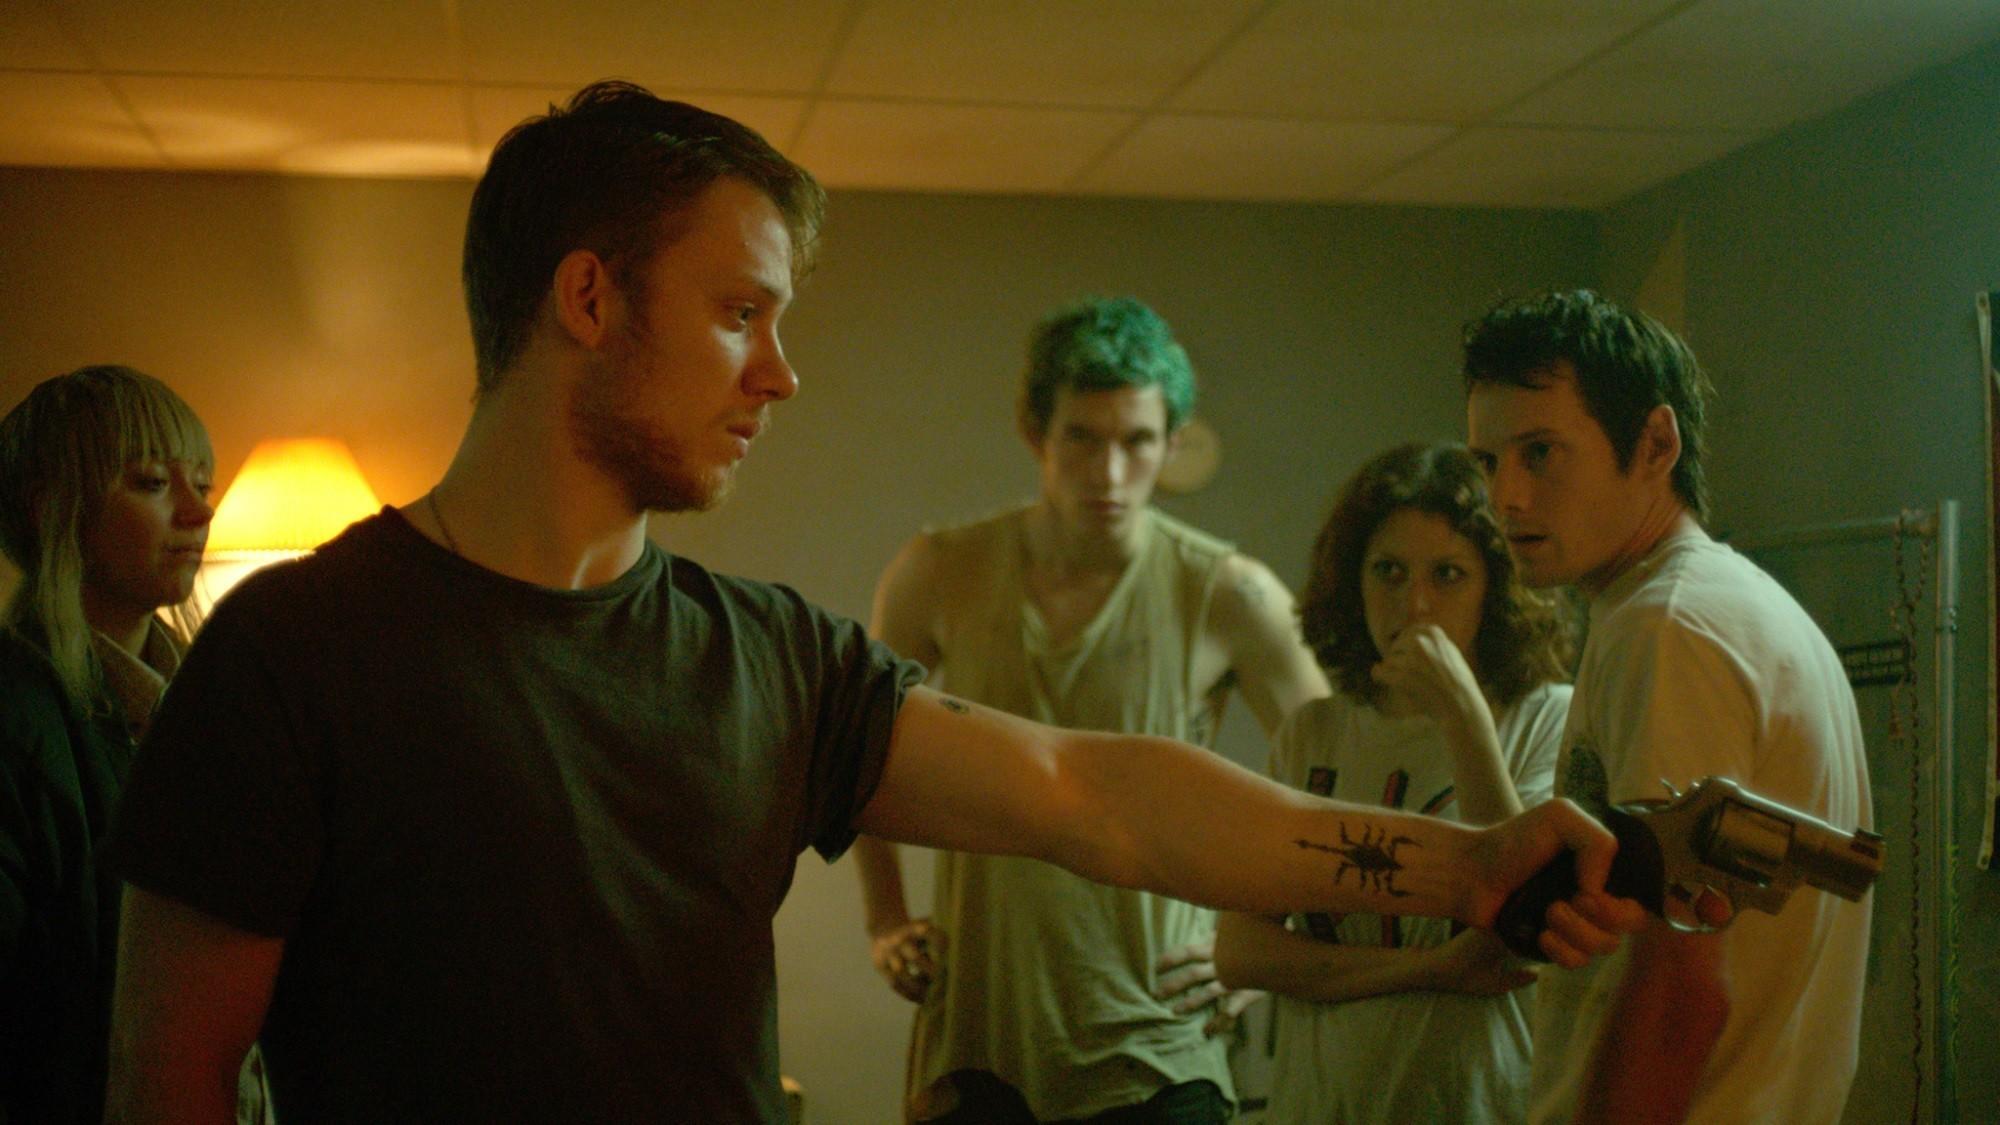 Imogen Poots, Joe Cole, Callum Turner, Alia Shawkat, and Anton Yelchin star in director Jeremy Saulnier's  Green Room